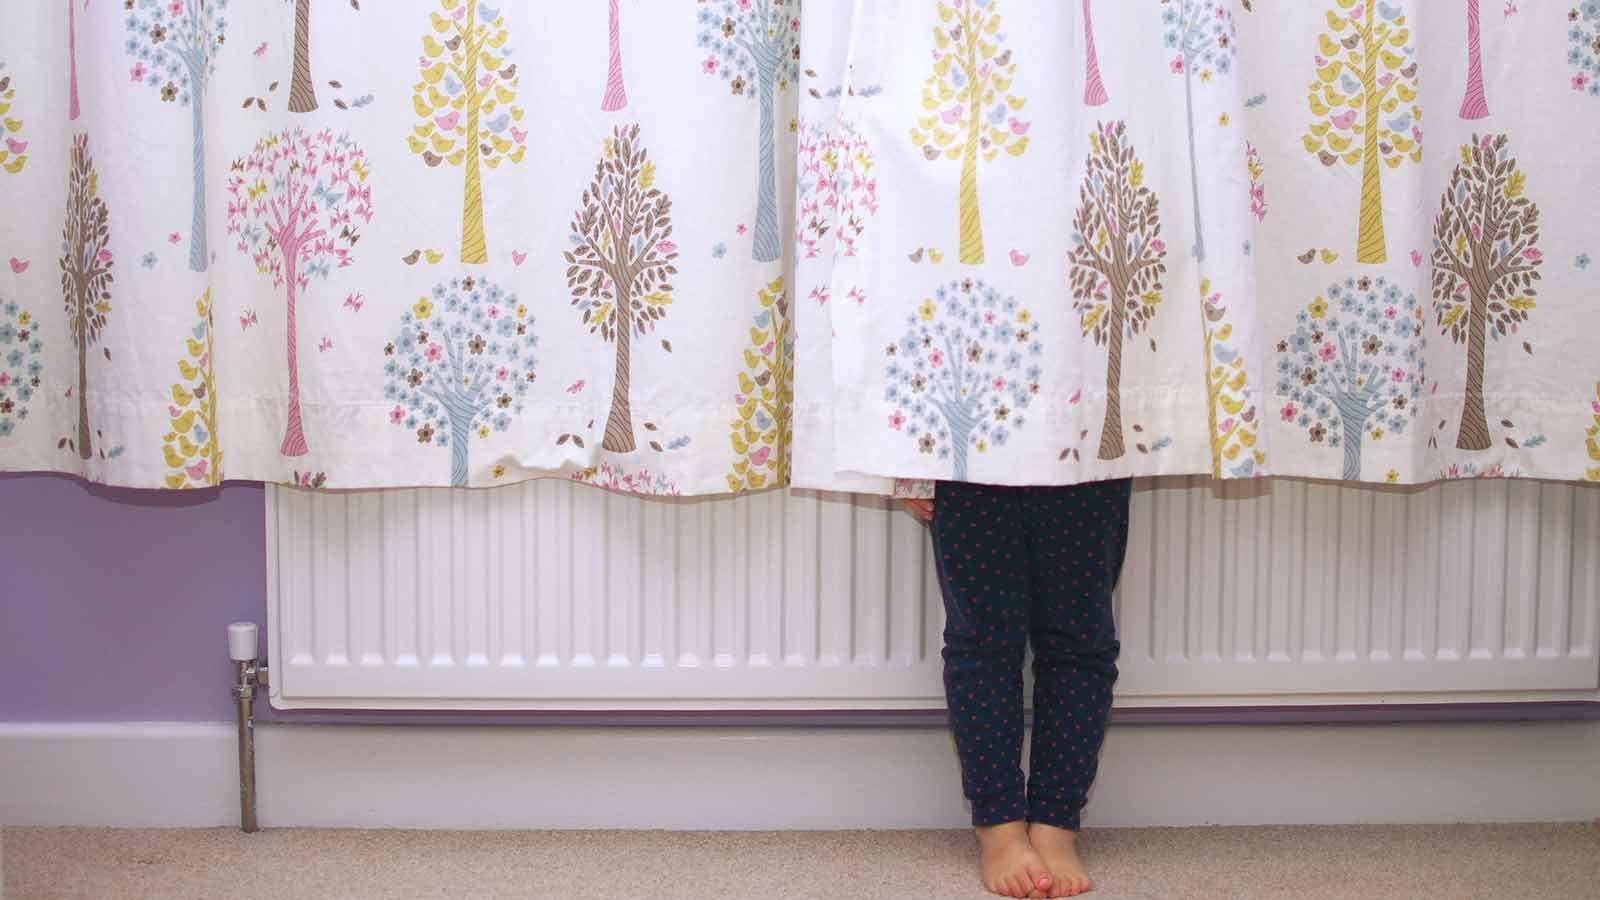 A little girl's legs showing beneath a curtain.